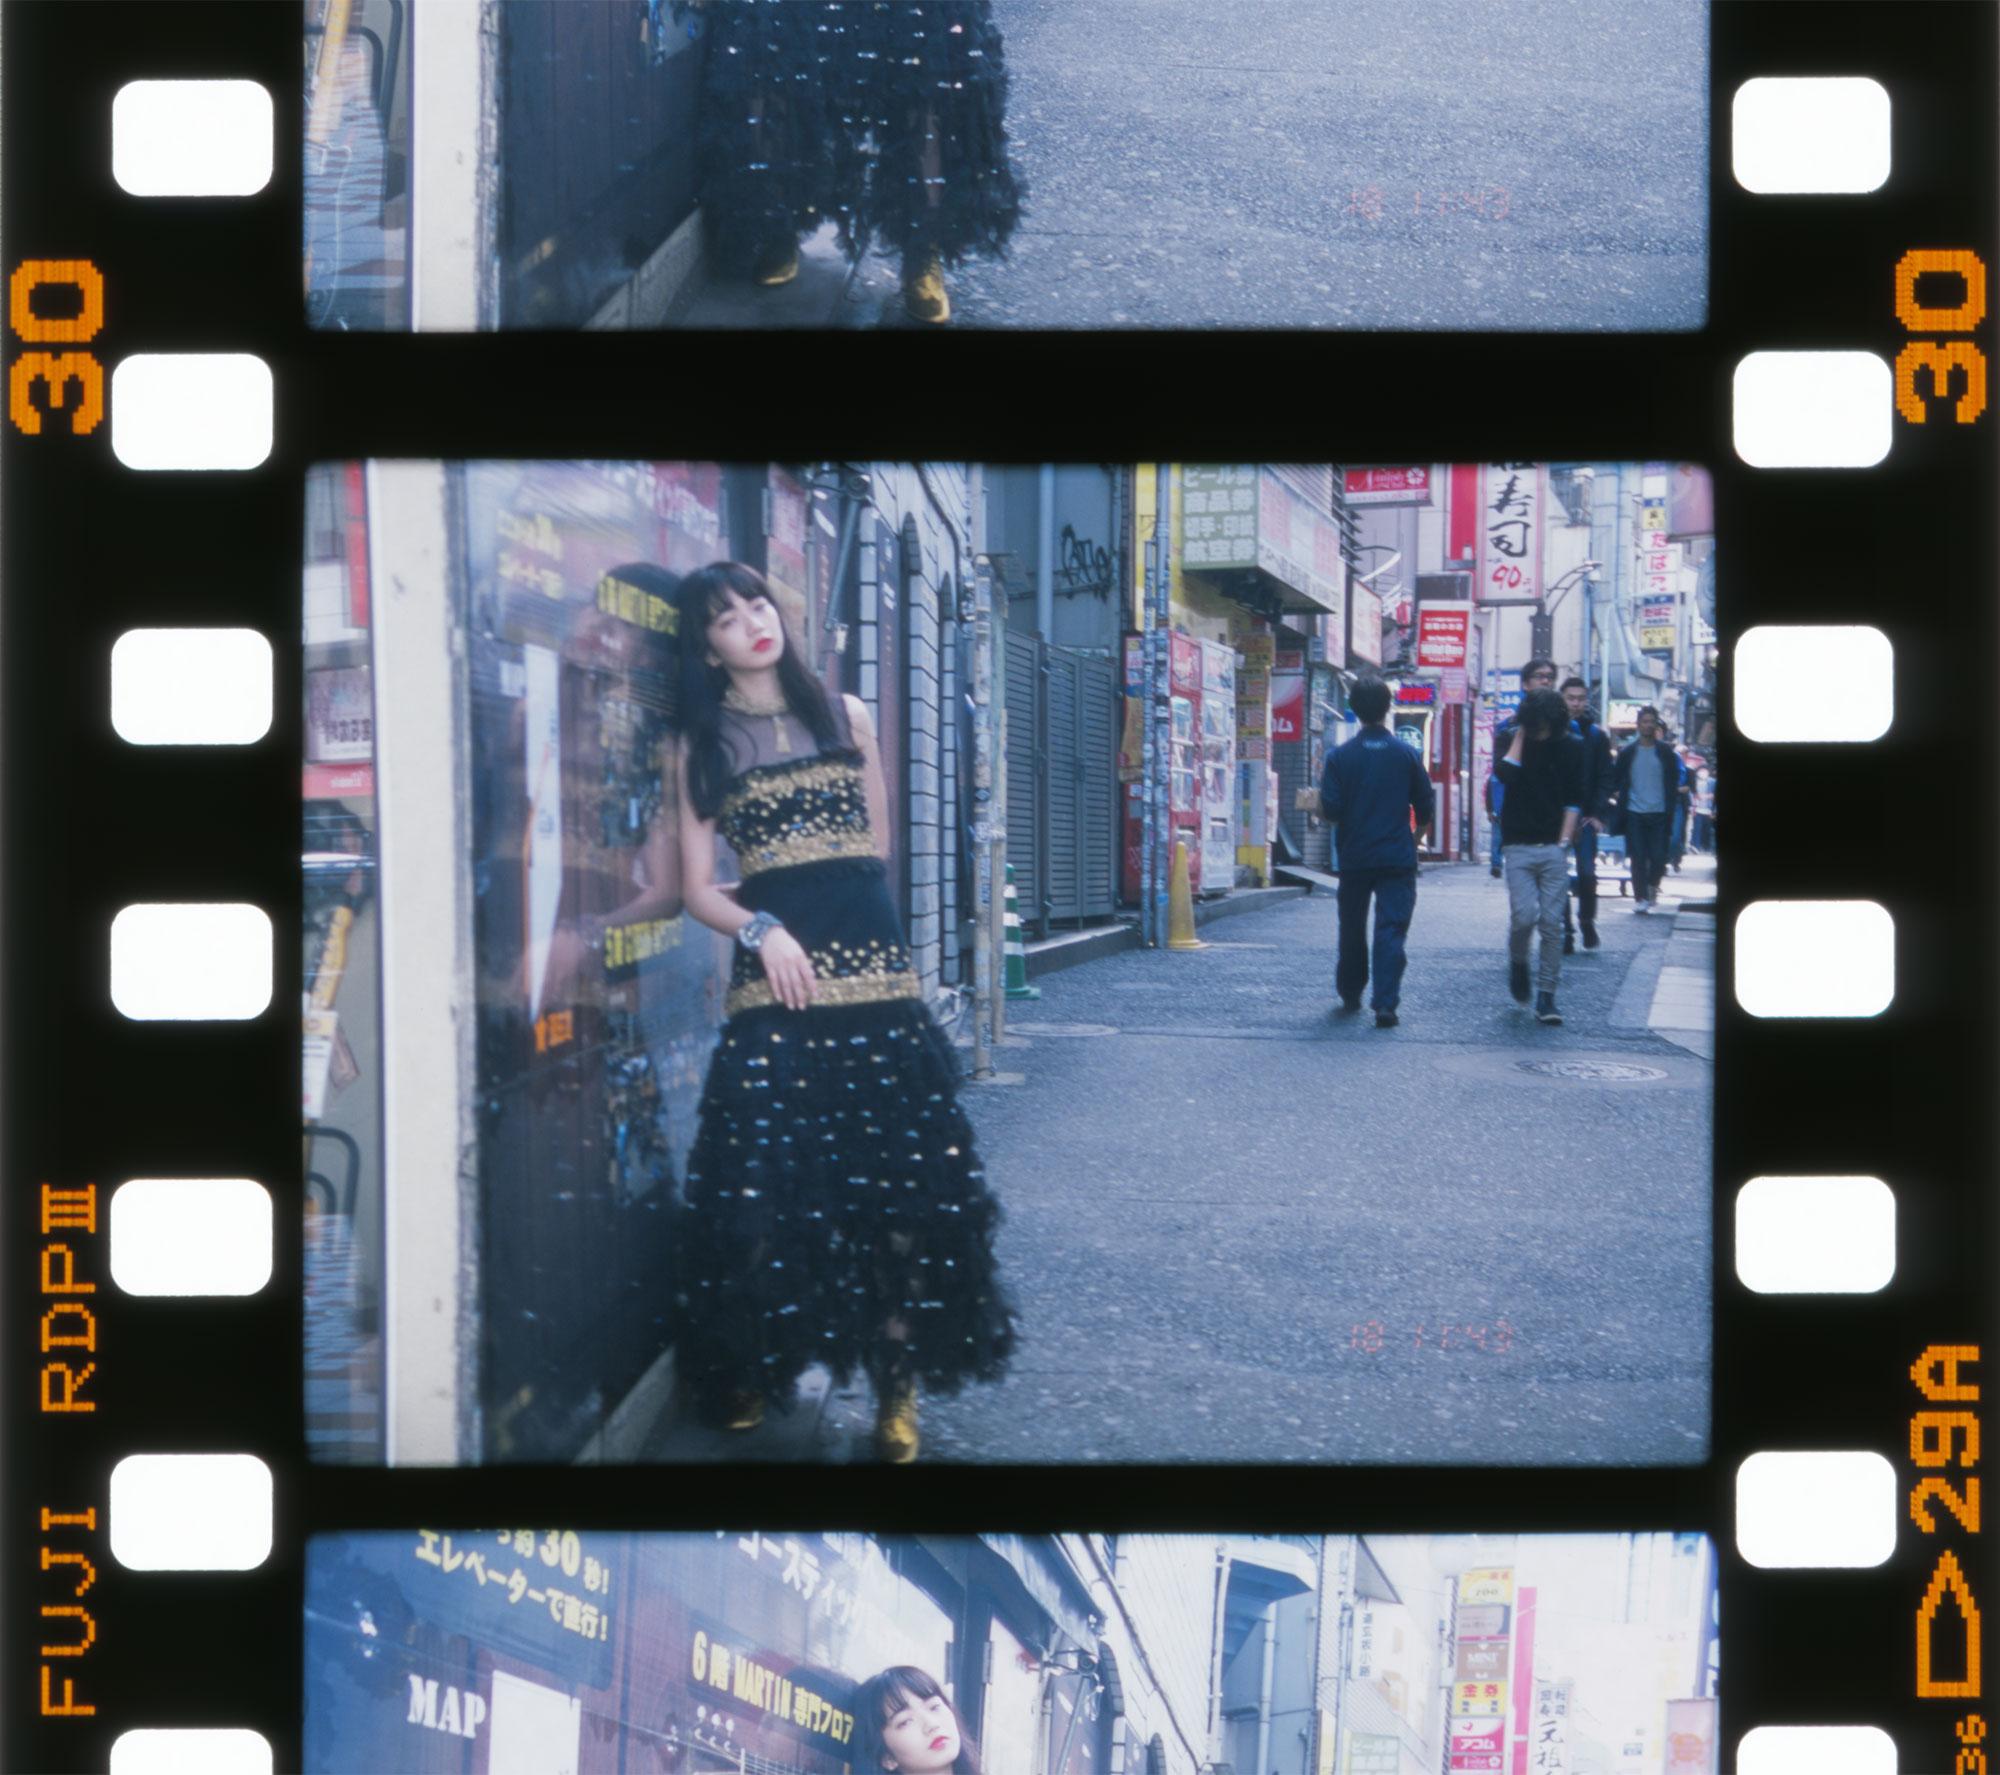 <The Look includes> ドレス ¥ 5,400,000、シューズ ¥ 92,000、ネックレス¥ 488,000、ブレスレット¥ 312,000 全て Chanel